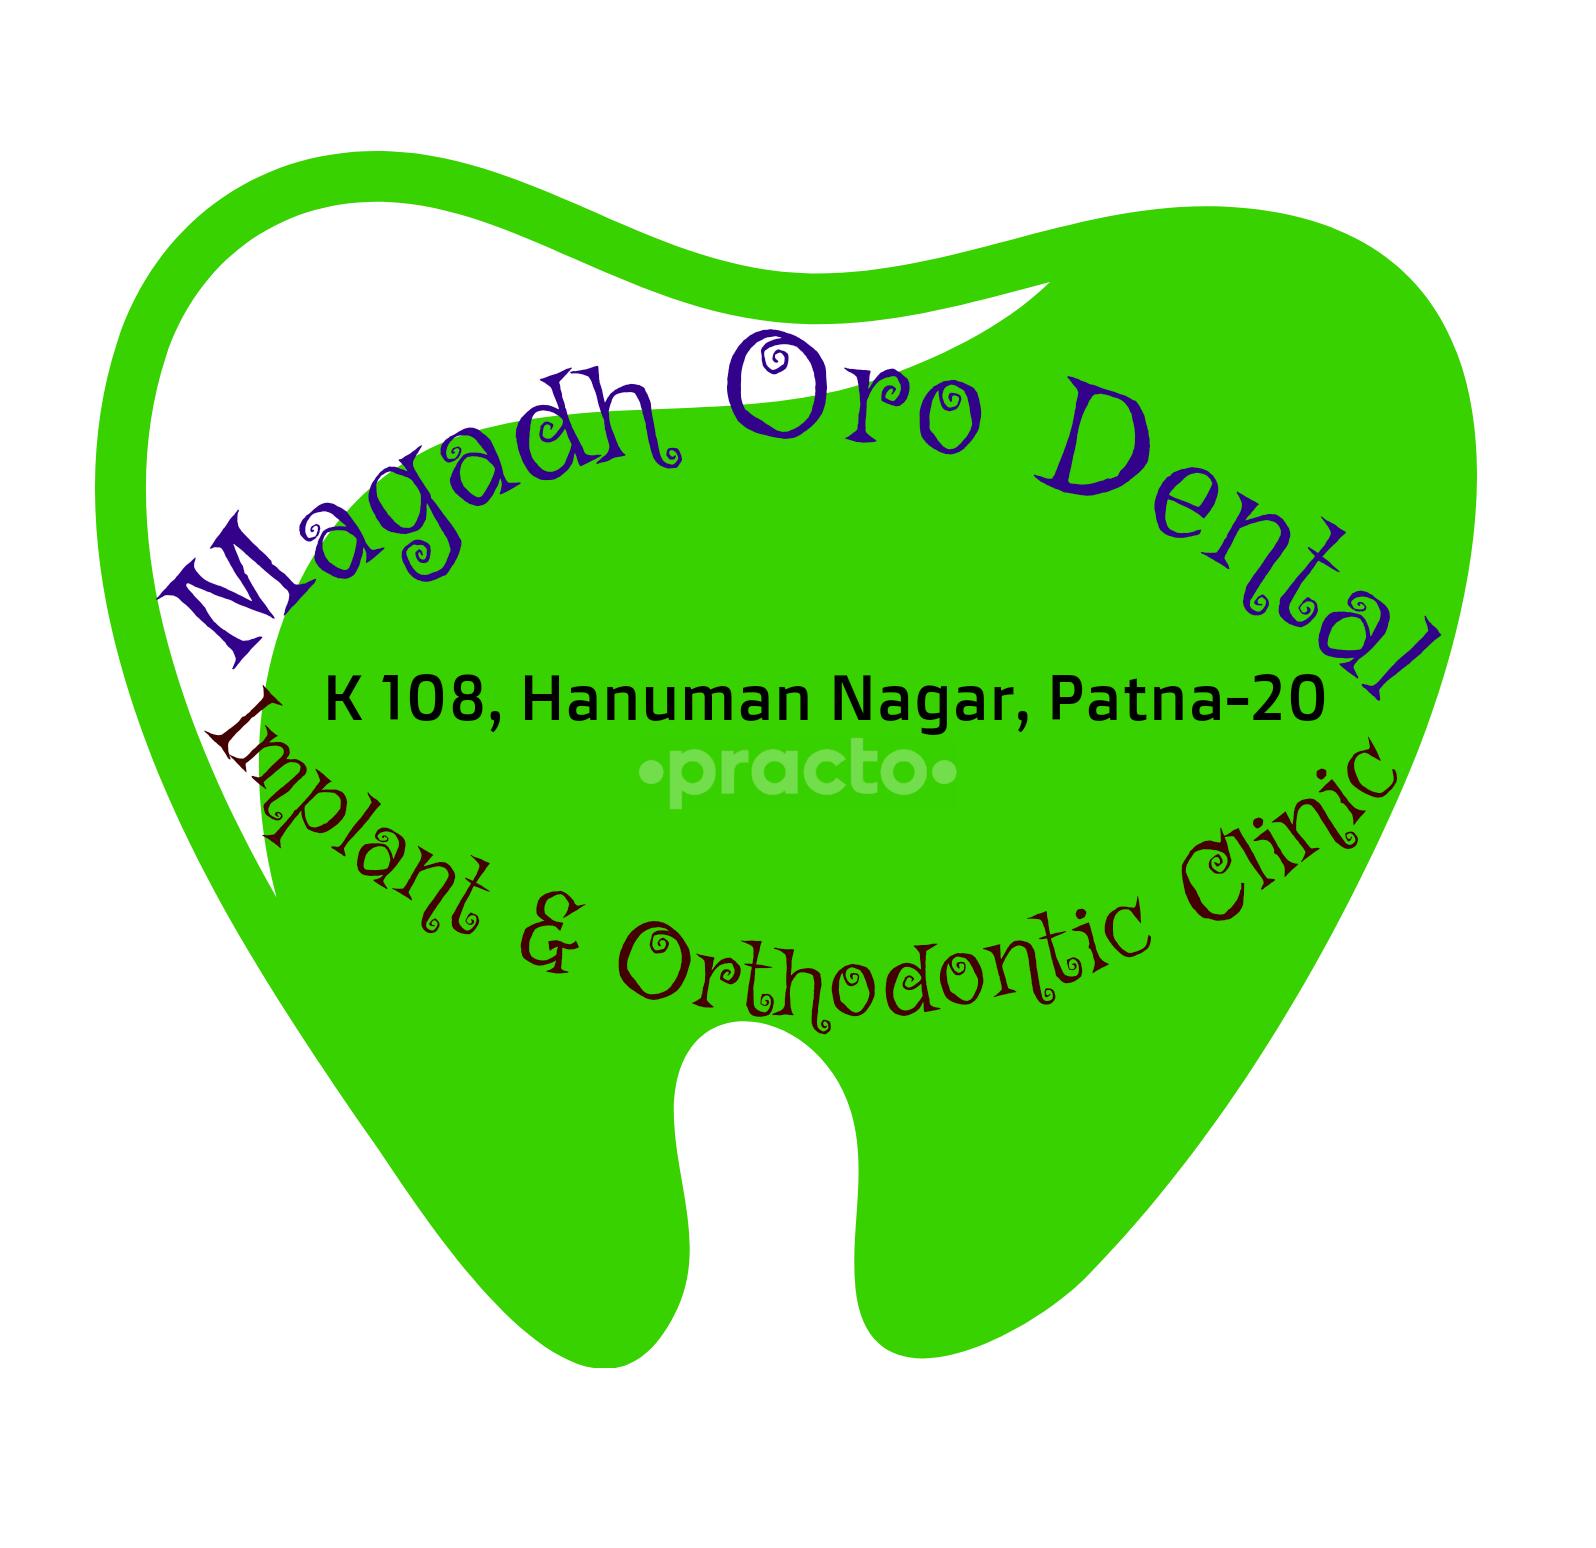 Magadh Oro Dental - Implant & Orthodontic Clinic